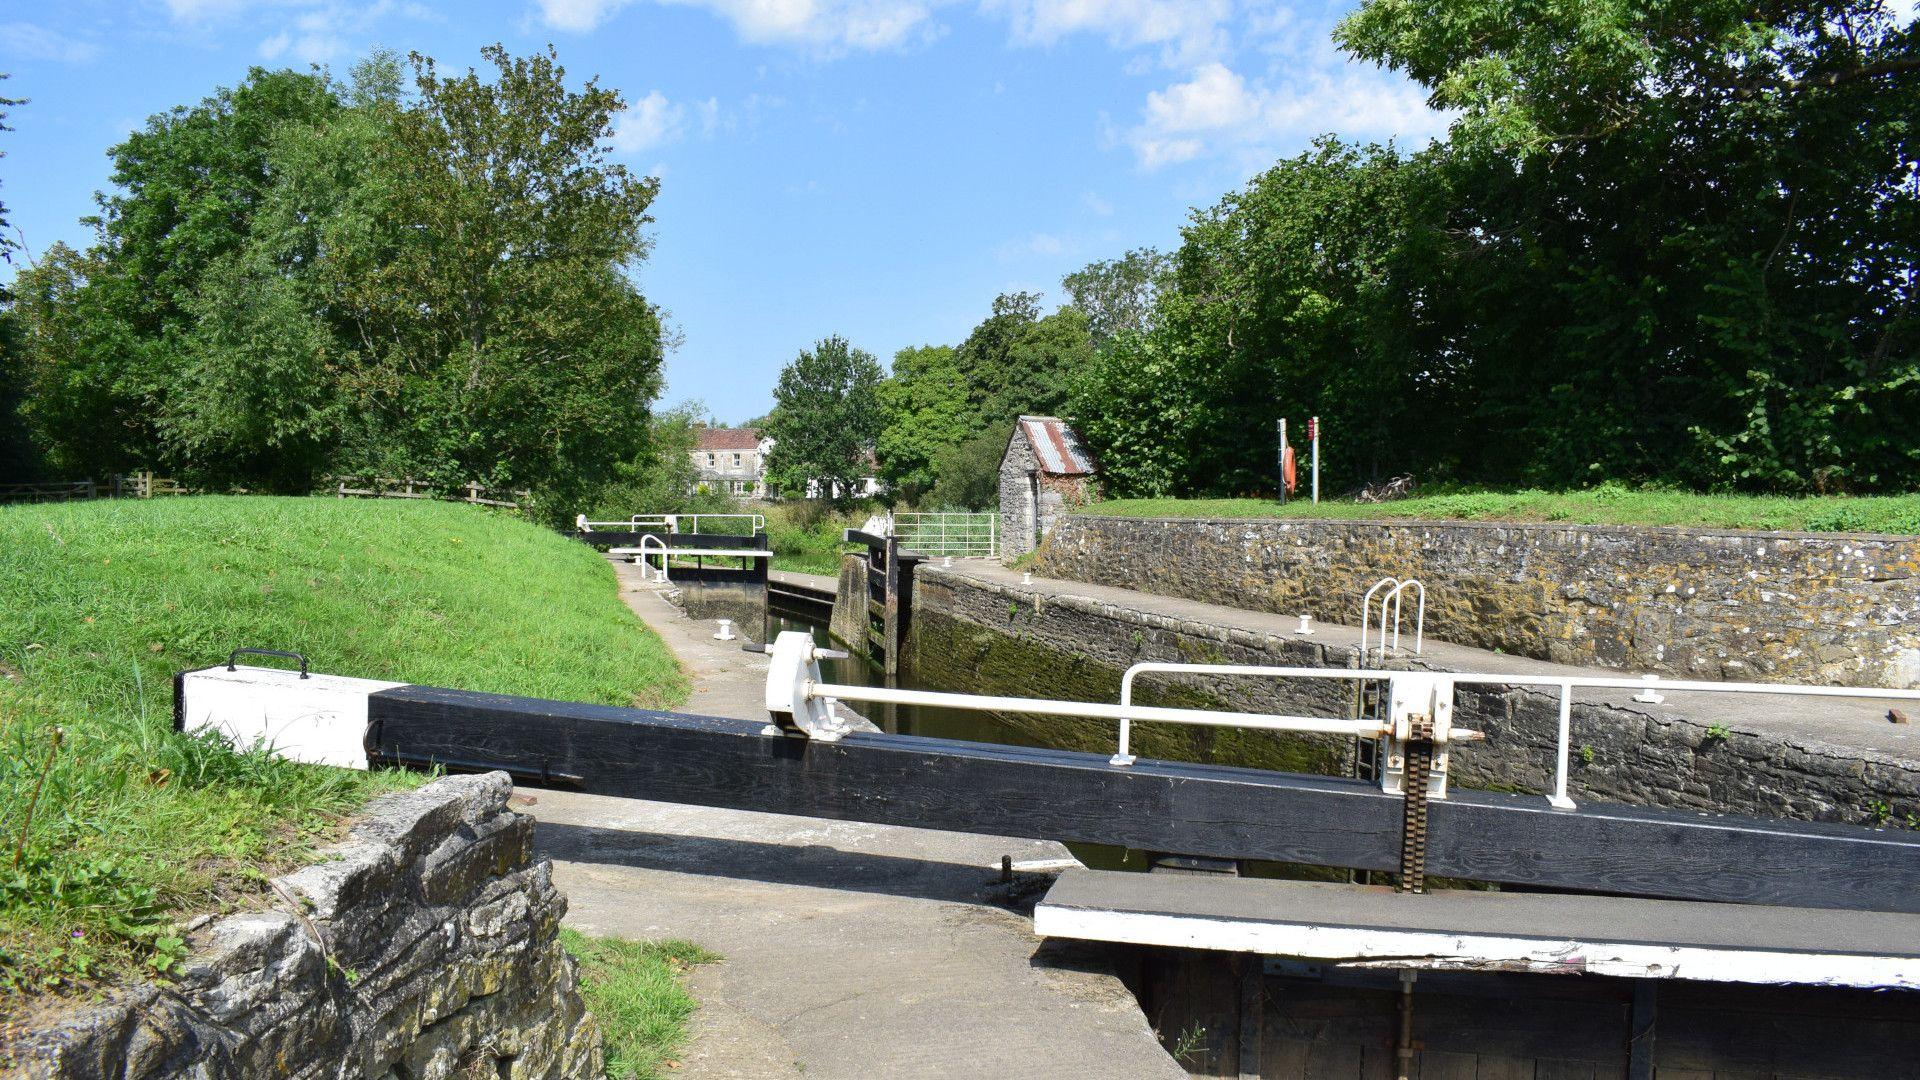 Lock on the River Avon, Meadow View at Avon Farm, Bolthole Retreats